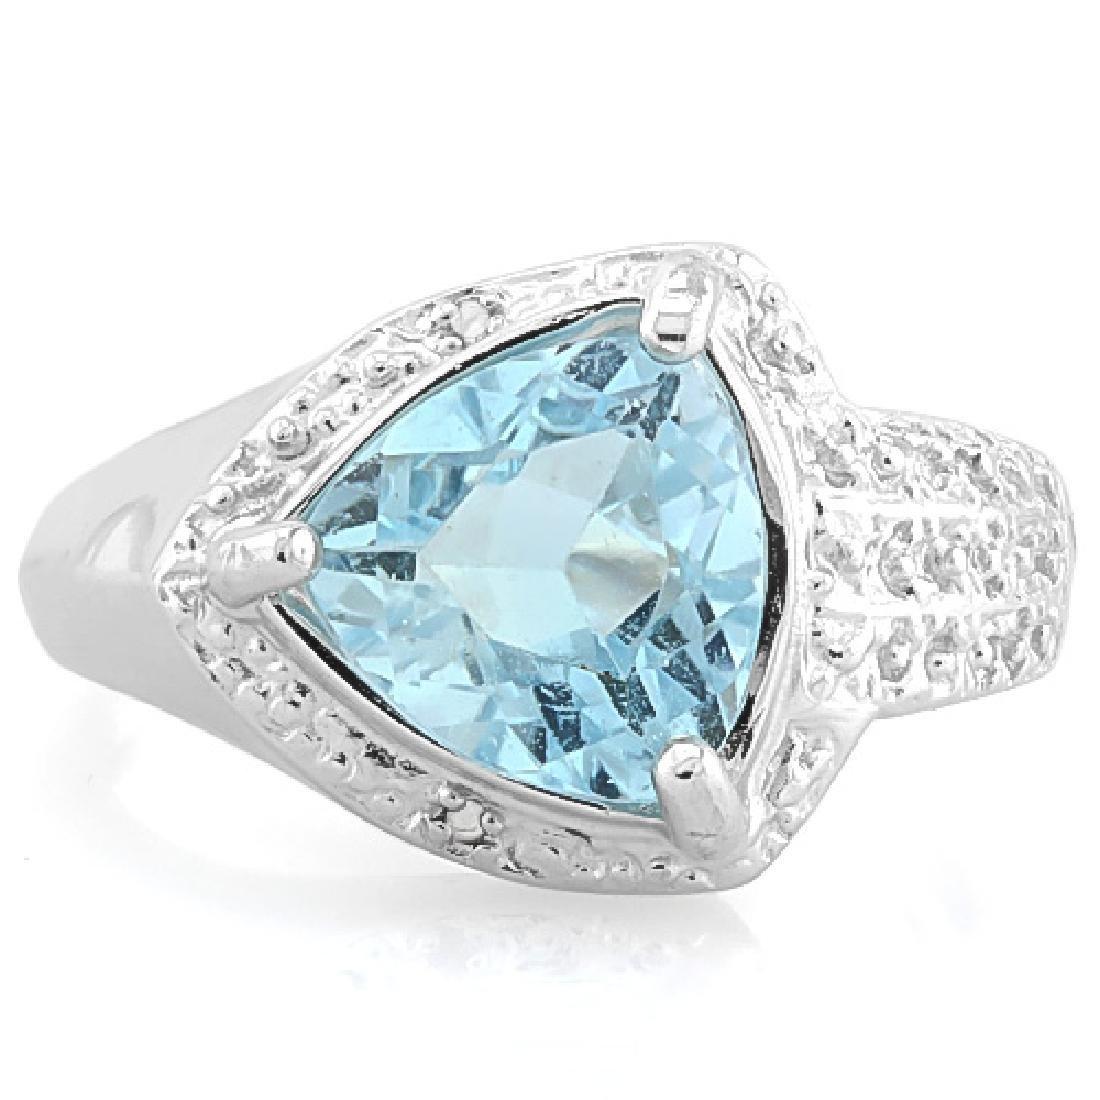 2 4/5 CARAT BABY SWISS BLUE TOPAZ & DIAMOND 925 STERLIN